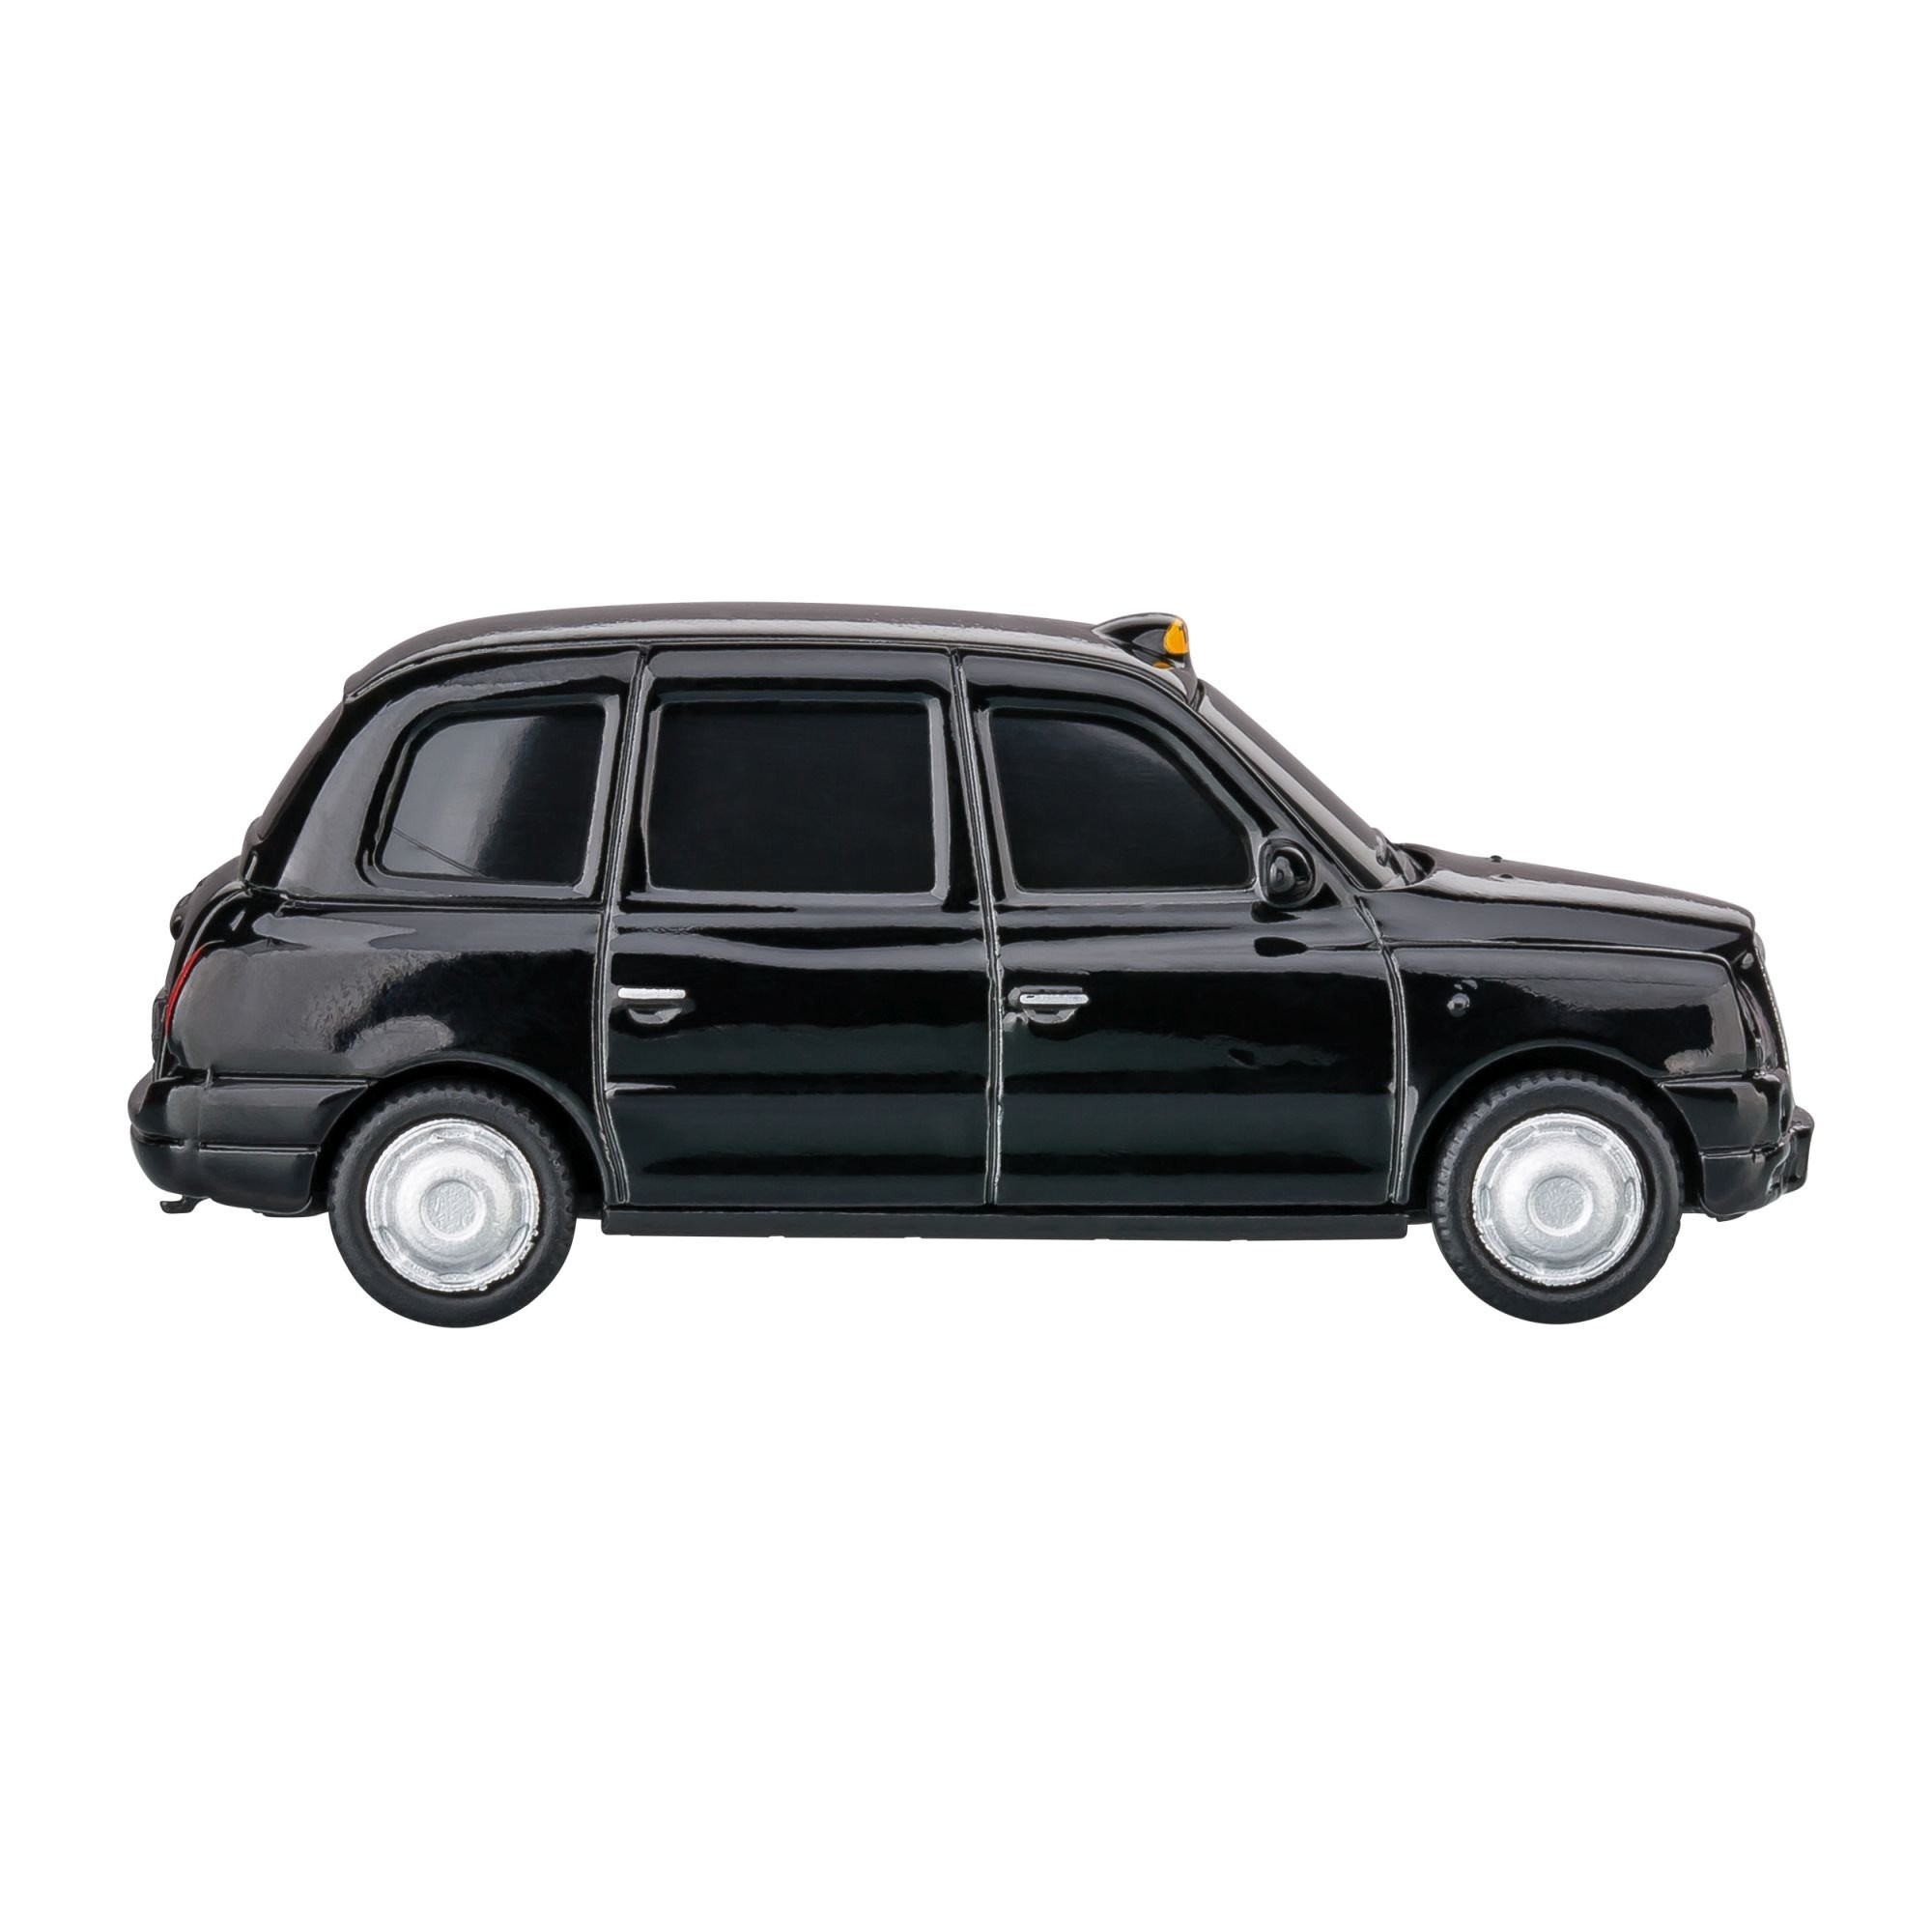 USB-Speicherstick London Taxi TX4 1:72 BLACK 16GB, Ansicht 3